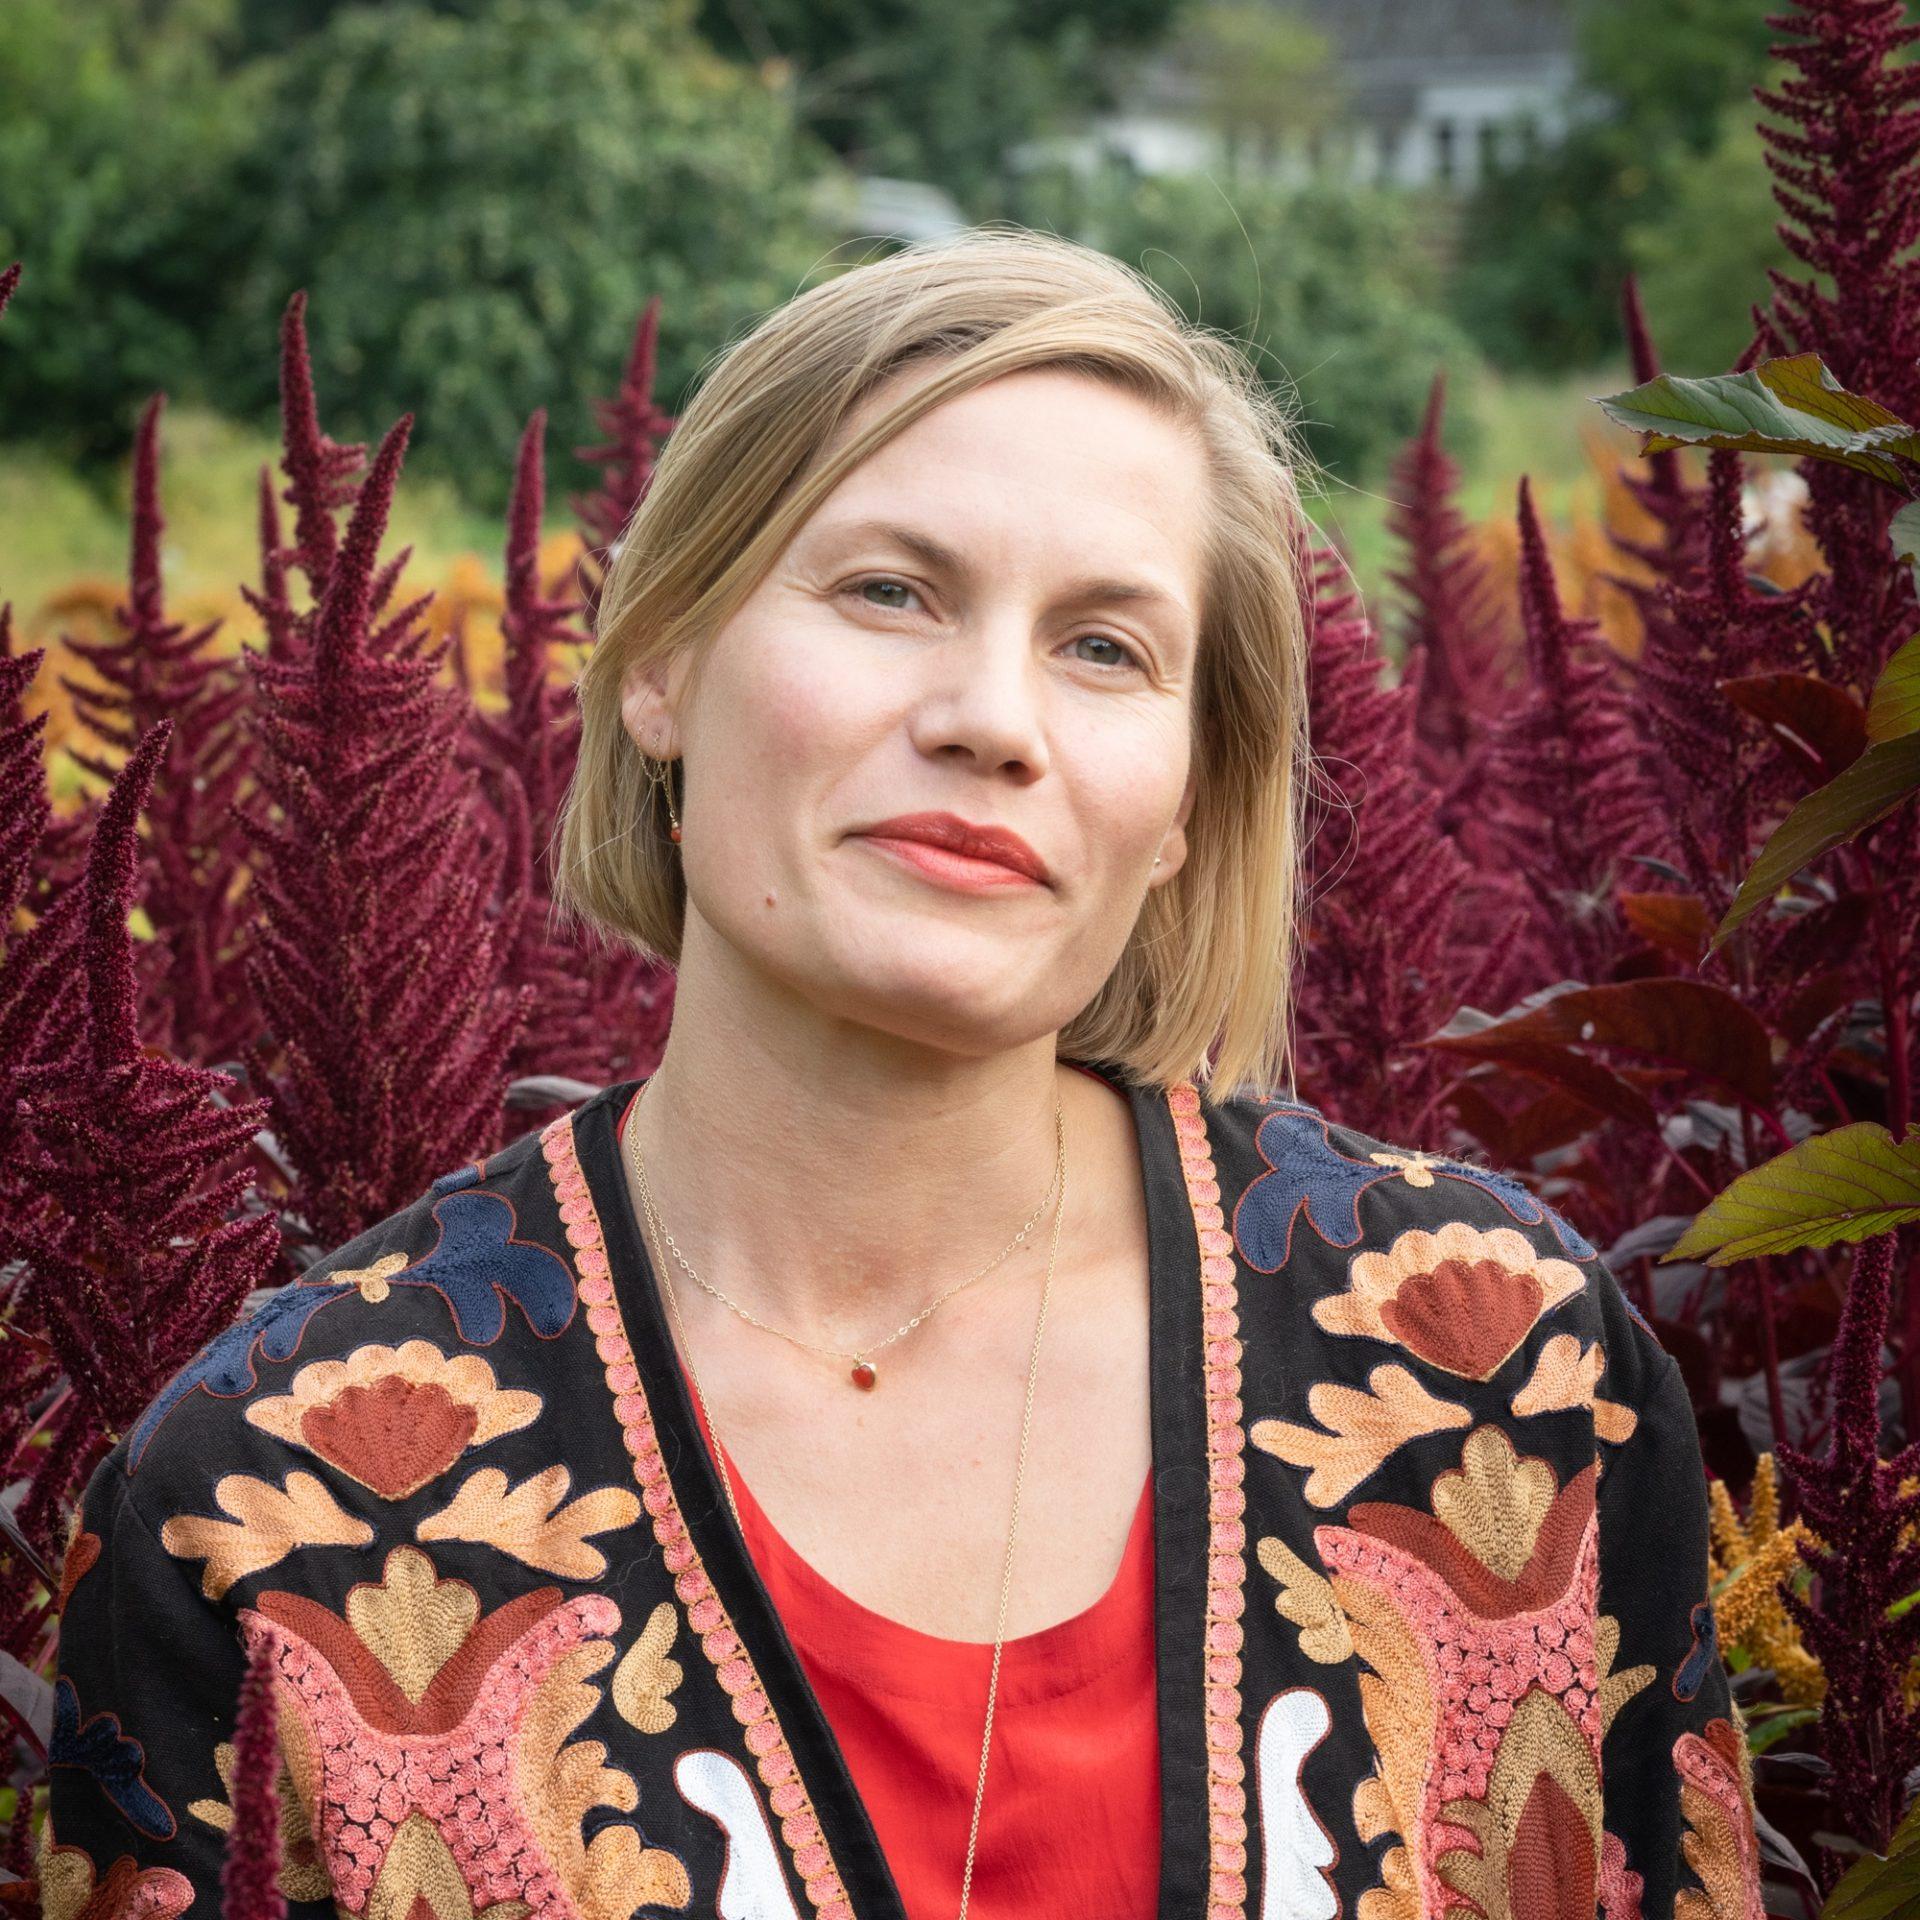 Terapeutiske seancer med Maria Kjær Themsen